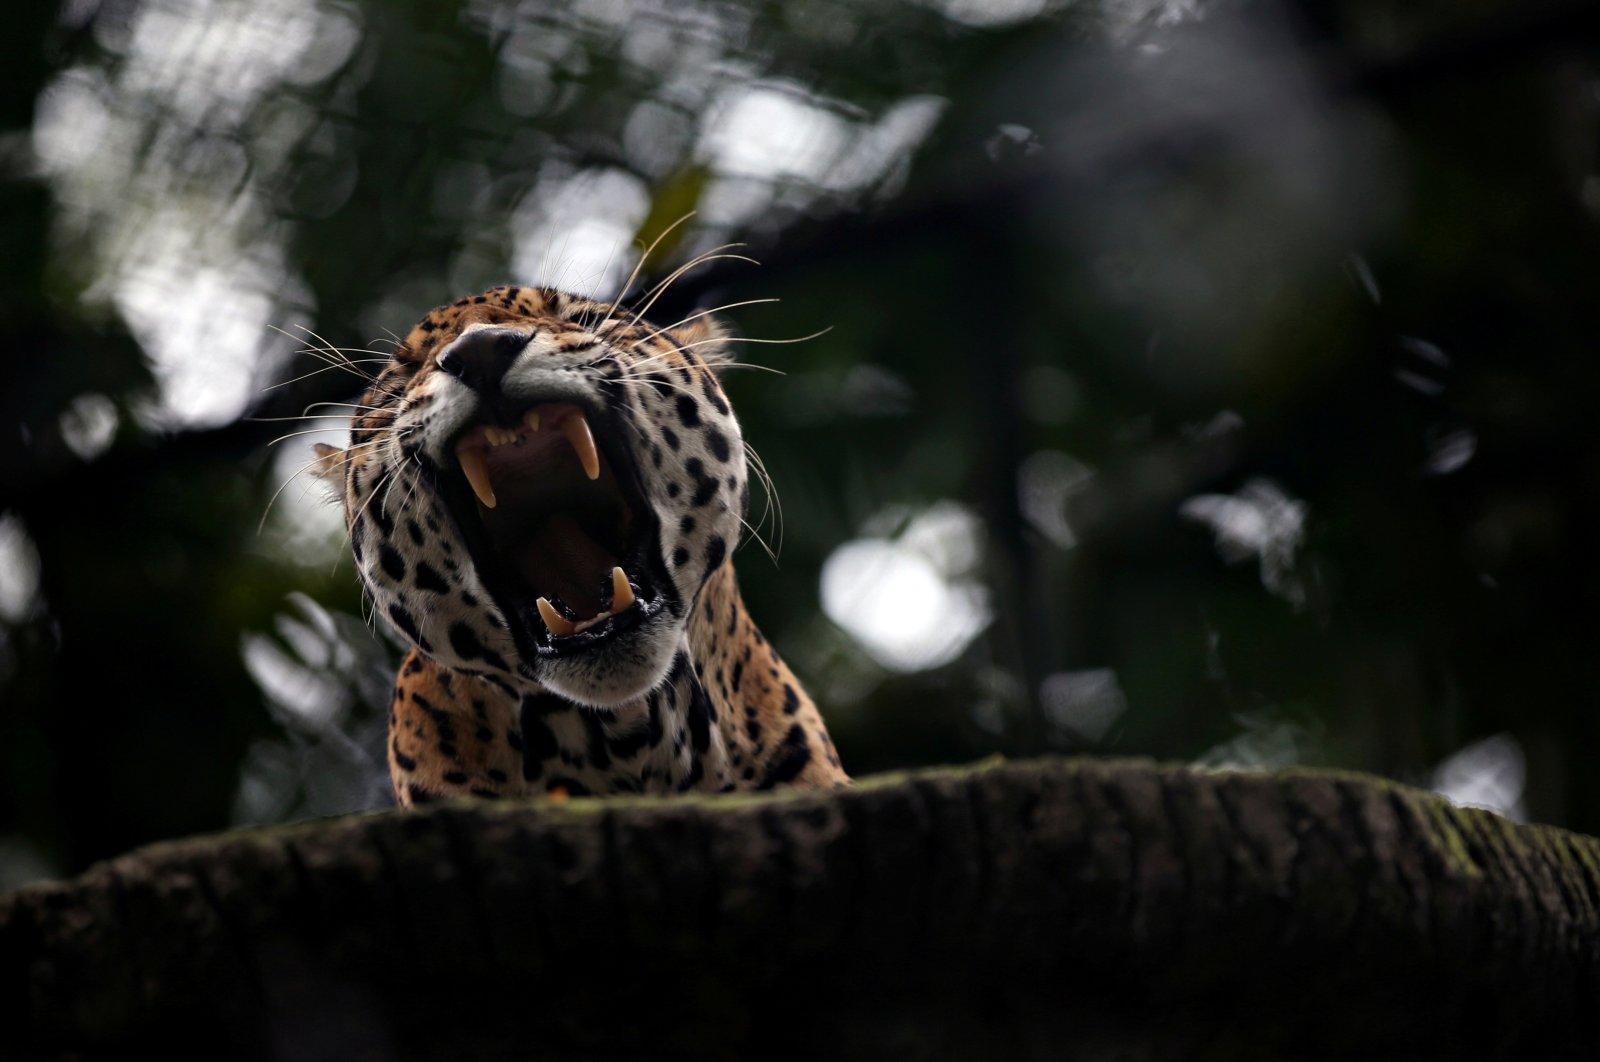 A jaguar yawns inside a cage at Santa Cruz Zoo, amid the outbreak of coronavirus disease in San Antonio del Tequendama, Colombia, April 8, 2020. (Reuters Photo)